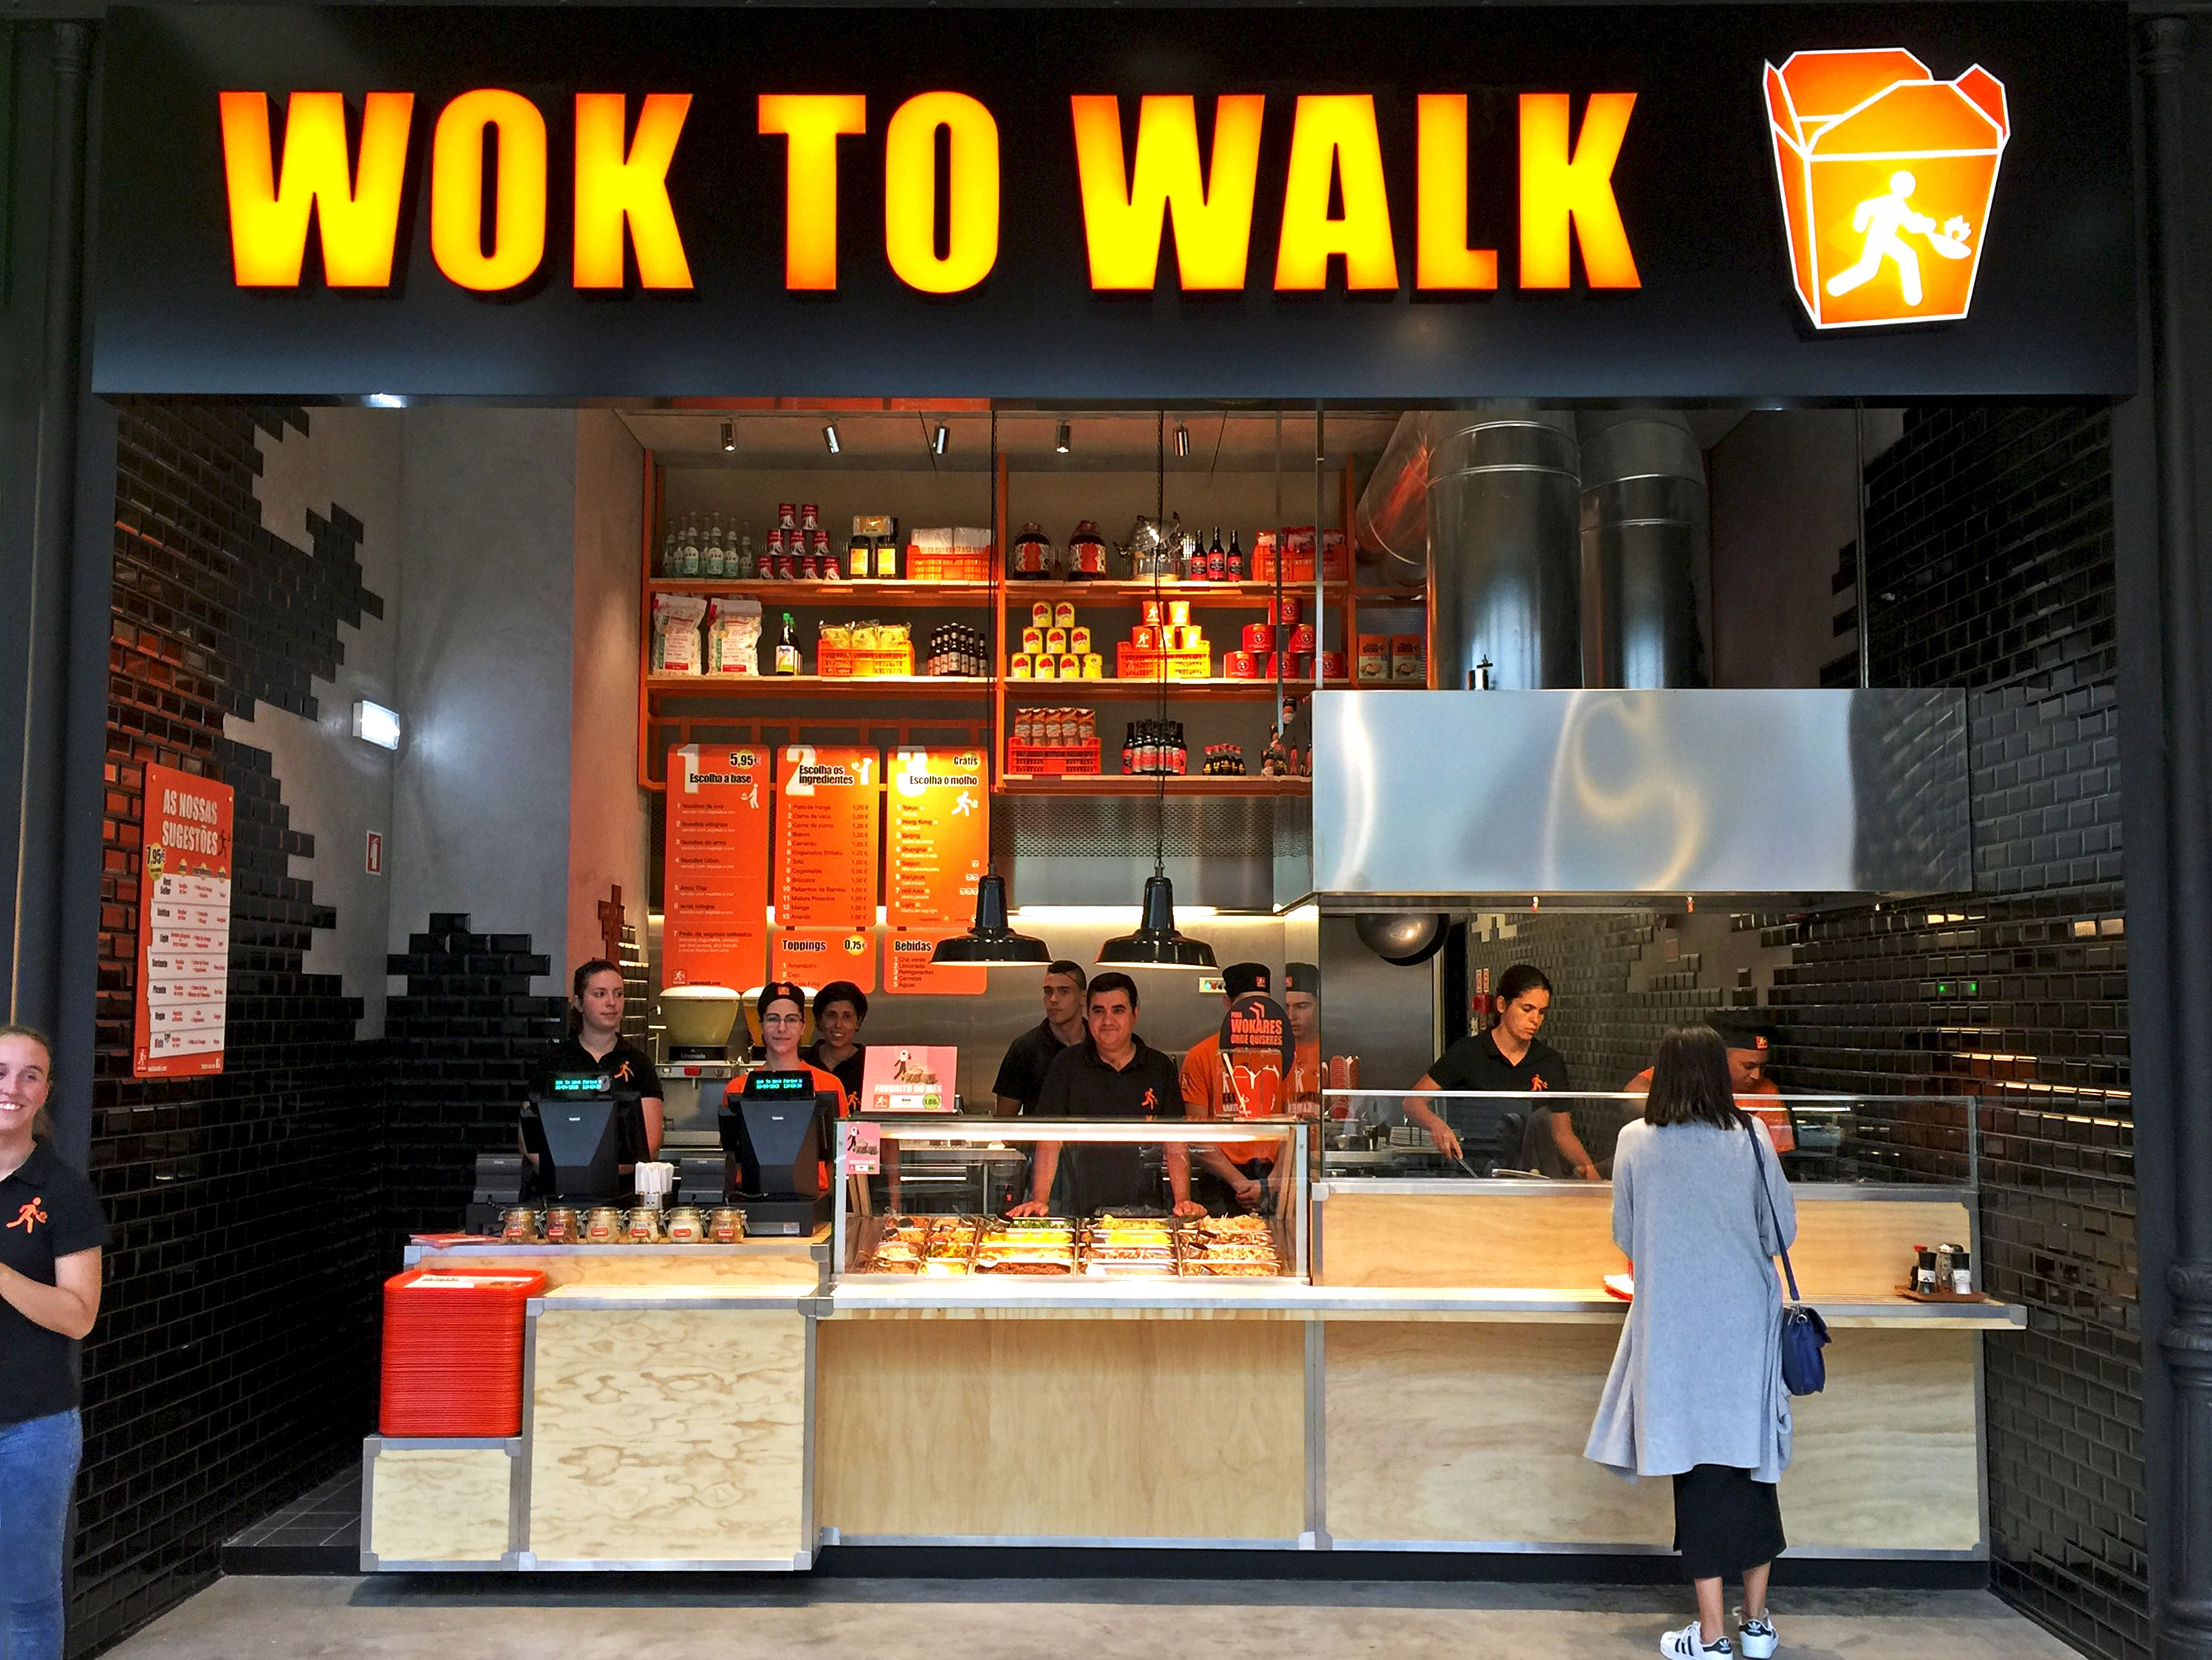 chinese kitchen range hood 42 inch sink image result for wok away | to walk pinterest woks